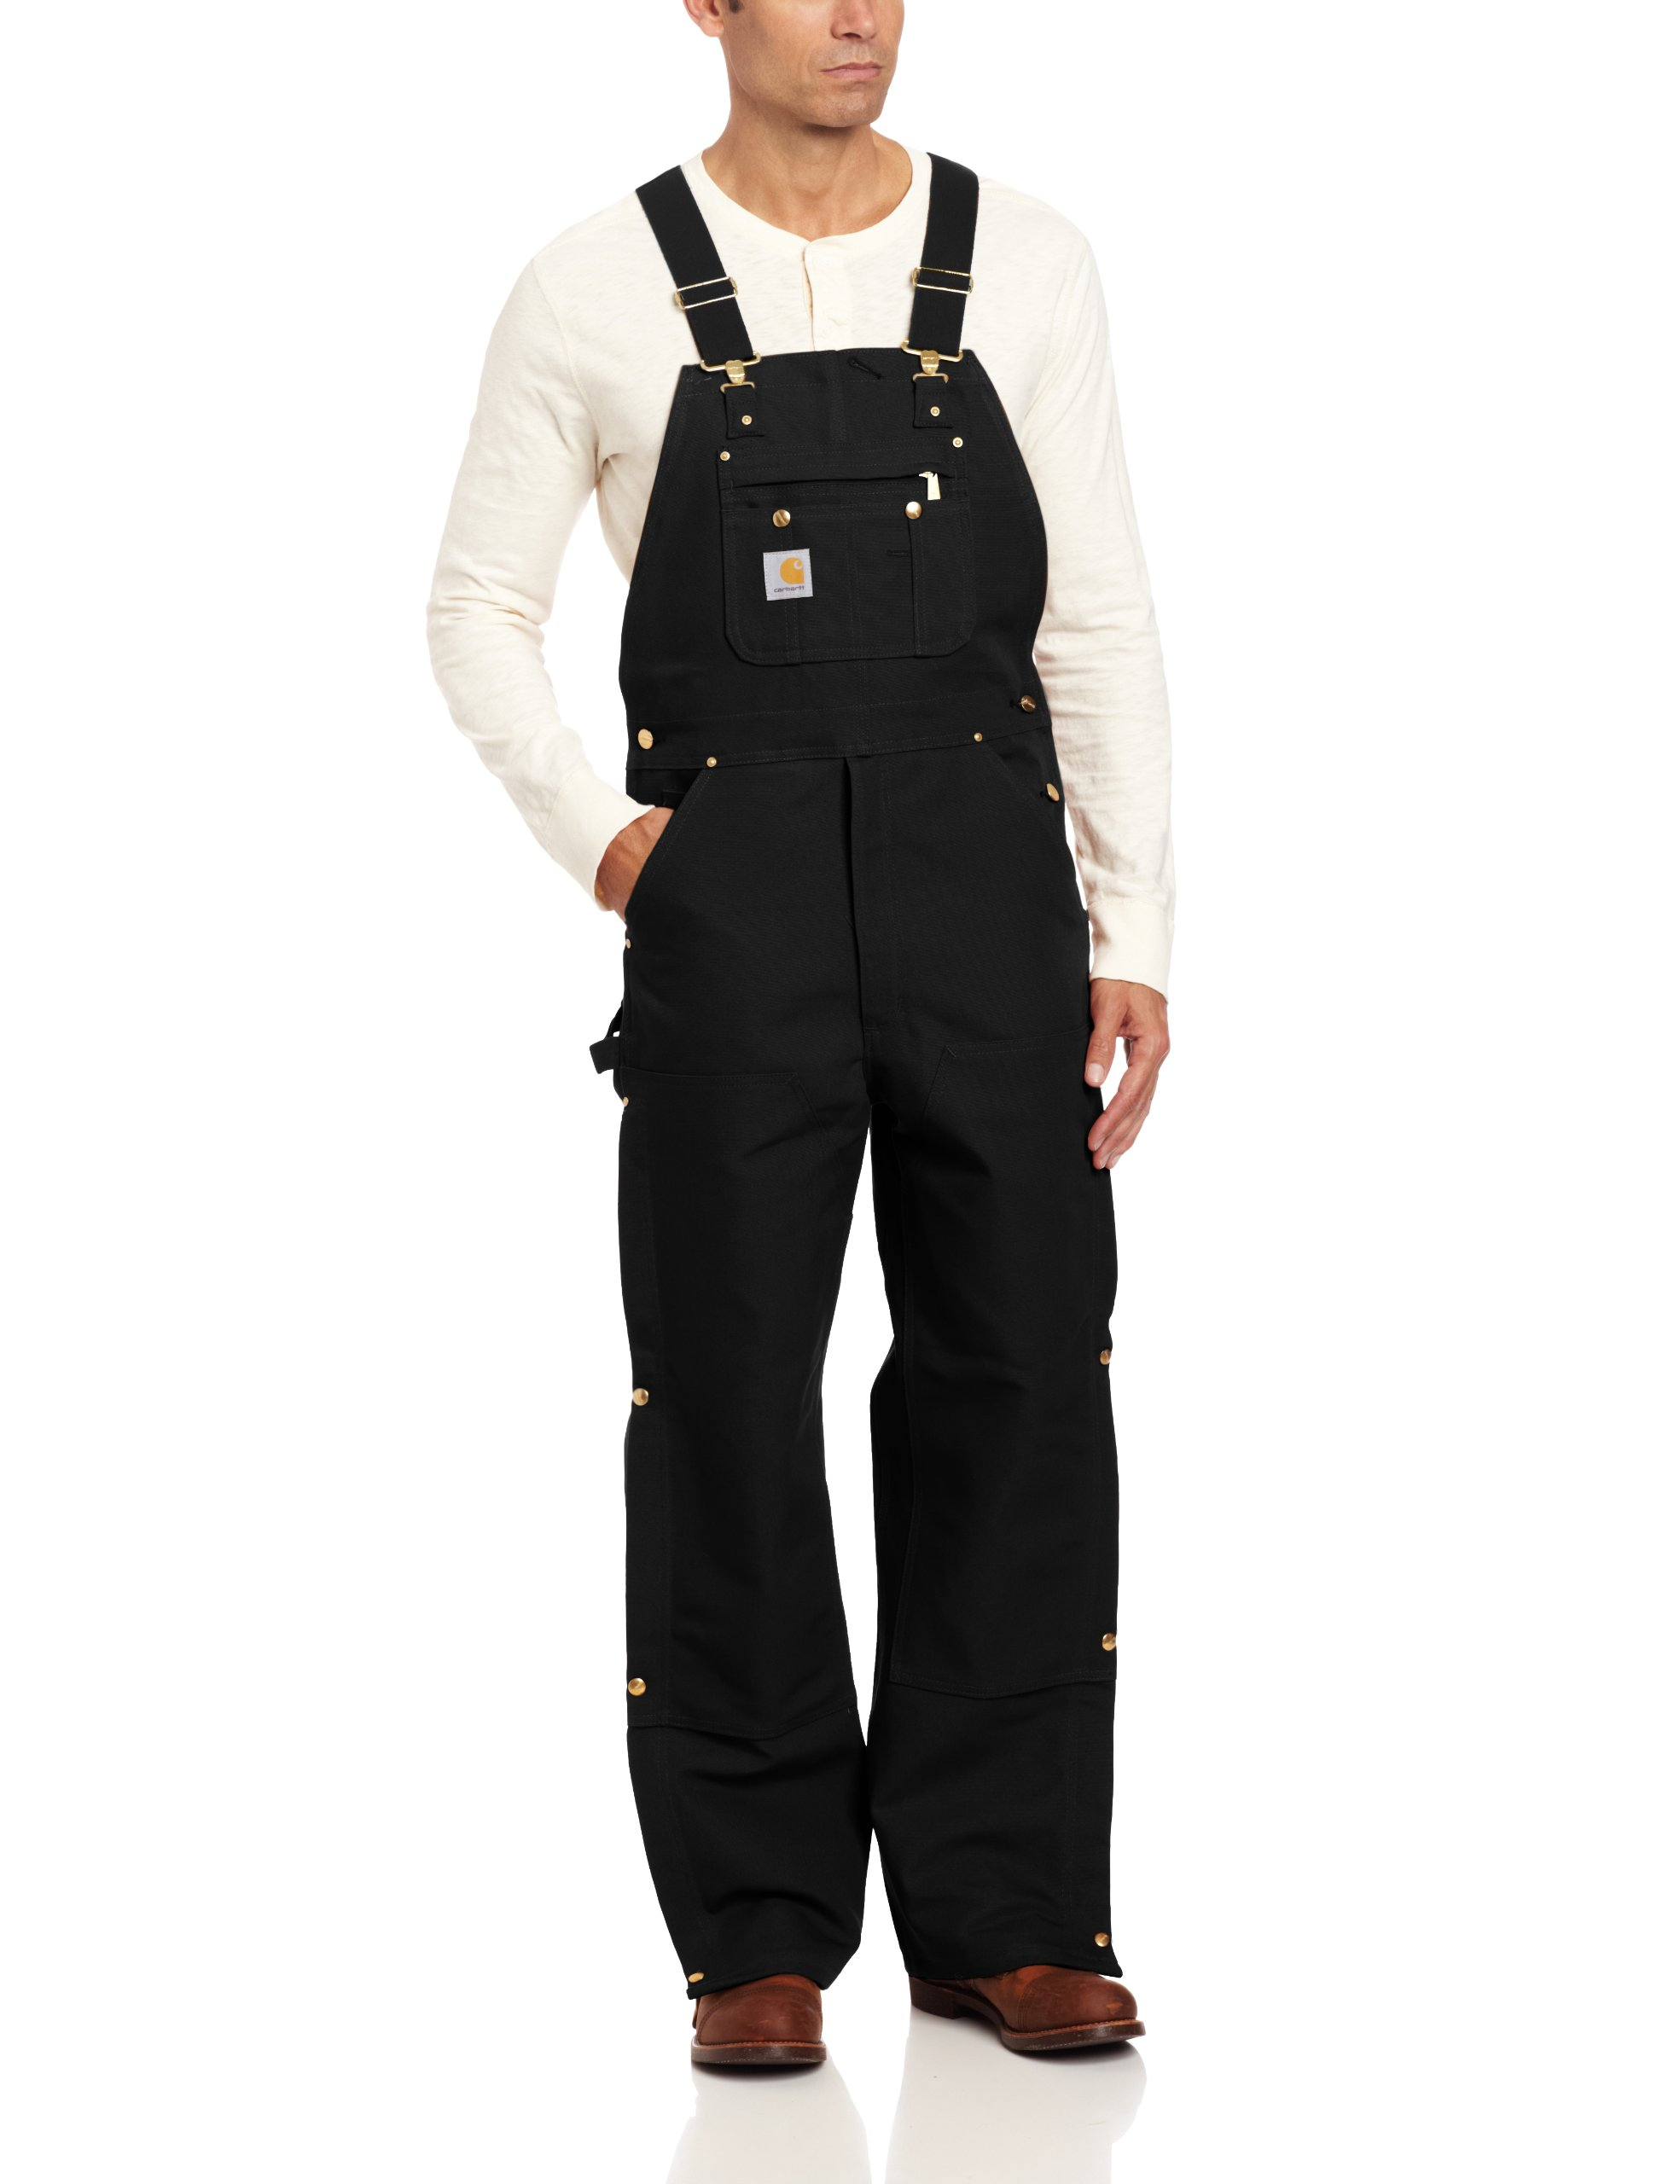 Carhartt Men's Zip To Thigh Bib Overall Unlined,Black,50 x 32